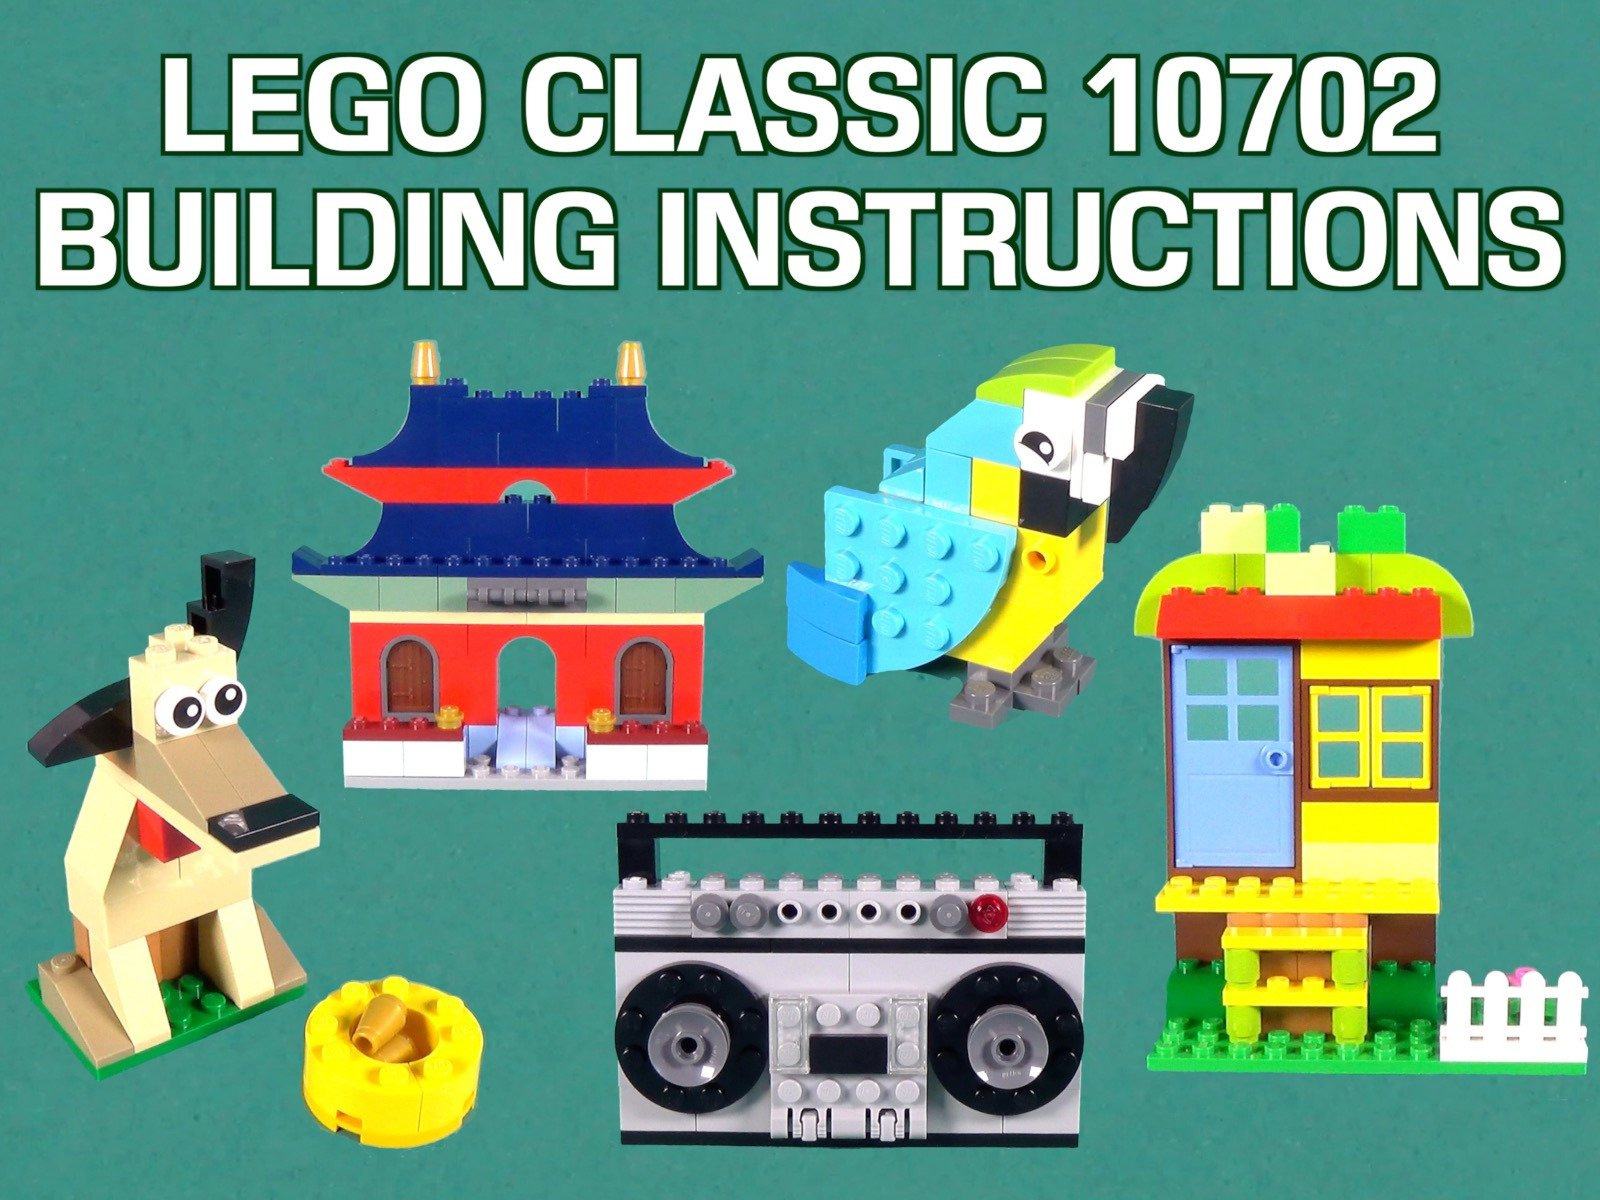 Amazoncom Watch Lego Classic 10702 Building Instructions Prime Video